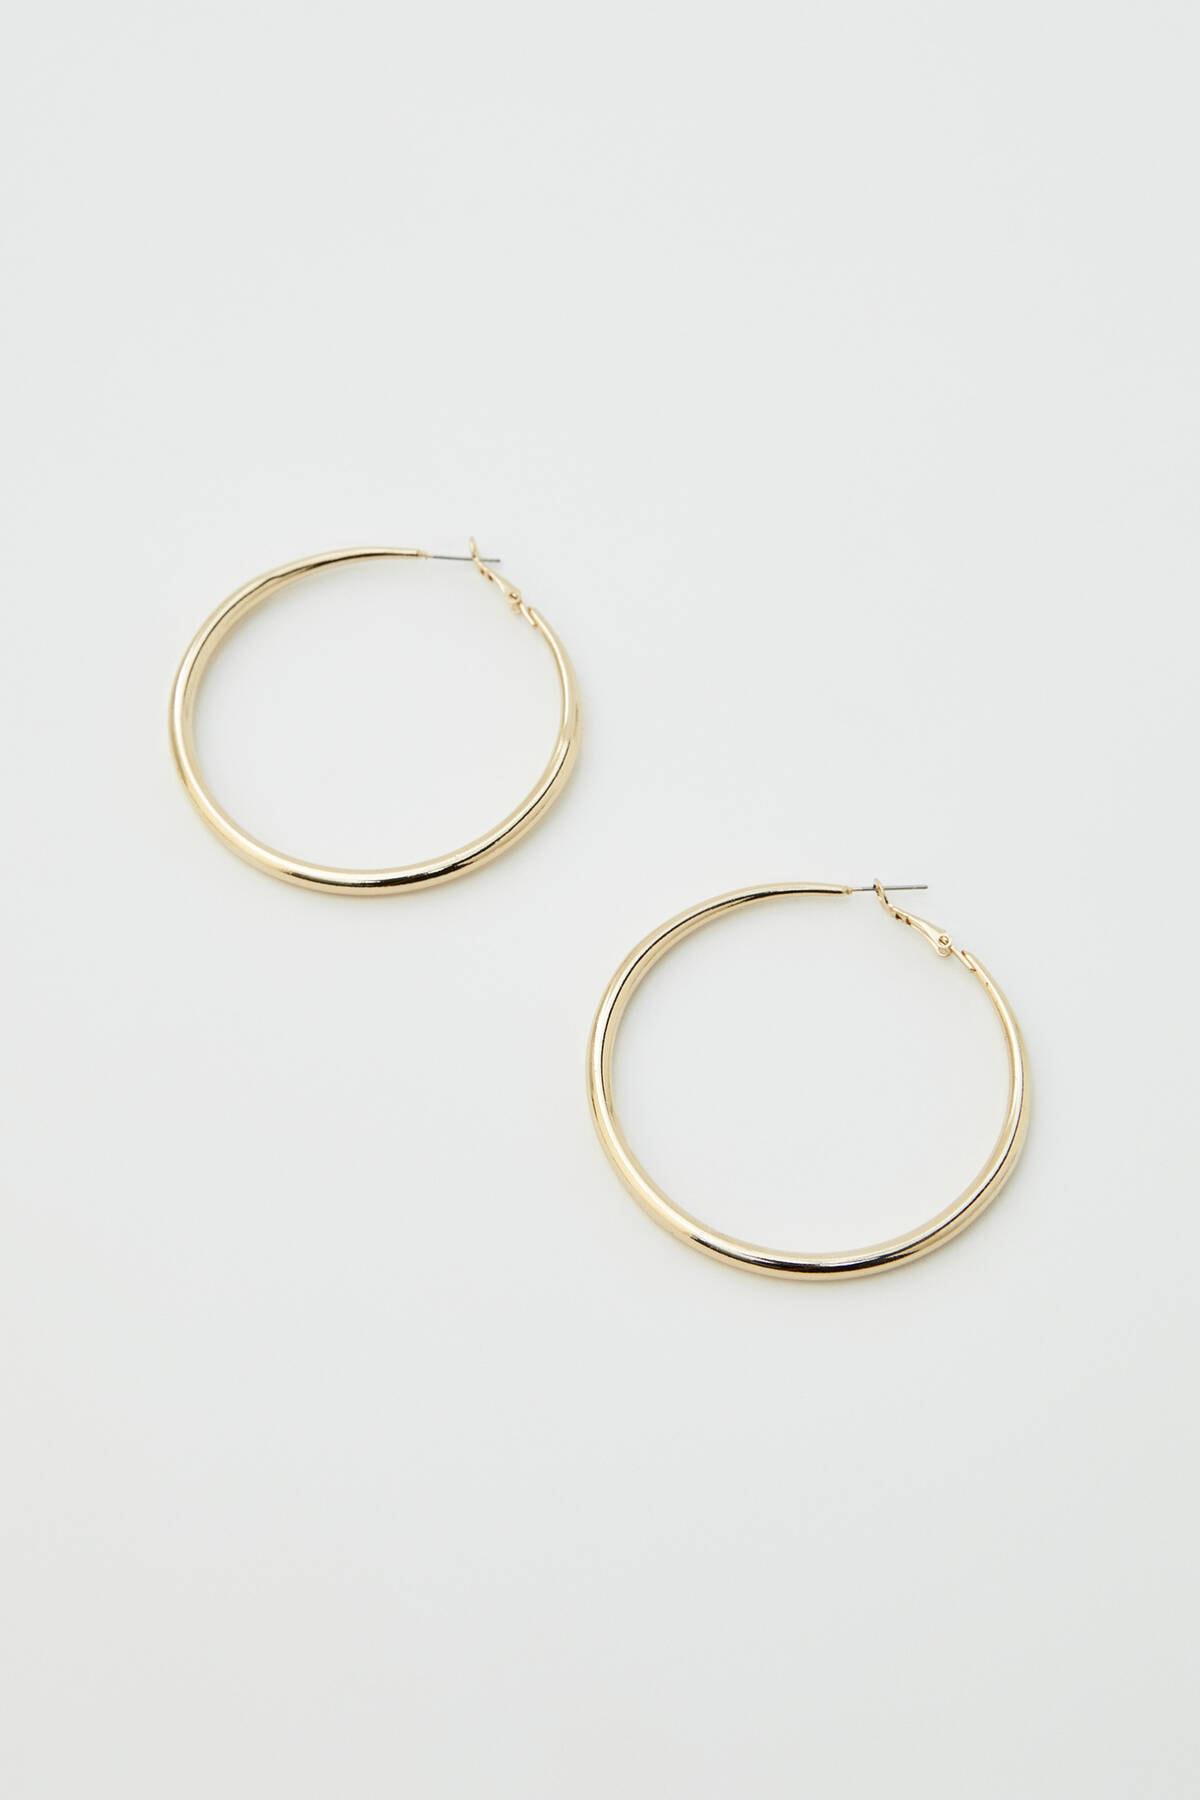 Pull & Bear Kadın Gümüş Karma Renkli Halka Küpe Seti 09996384 2